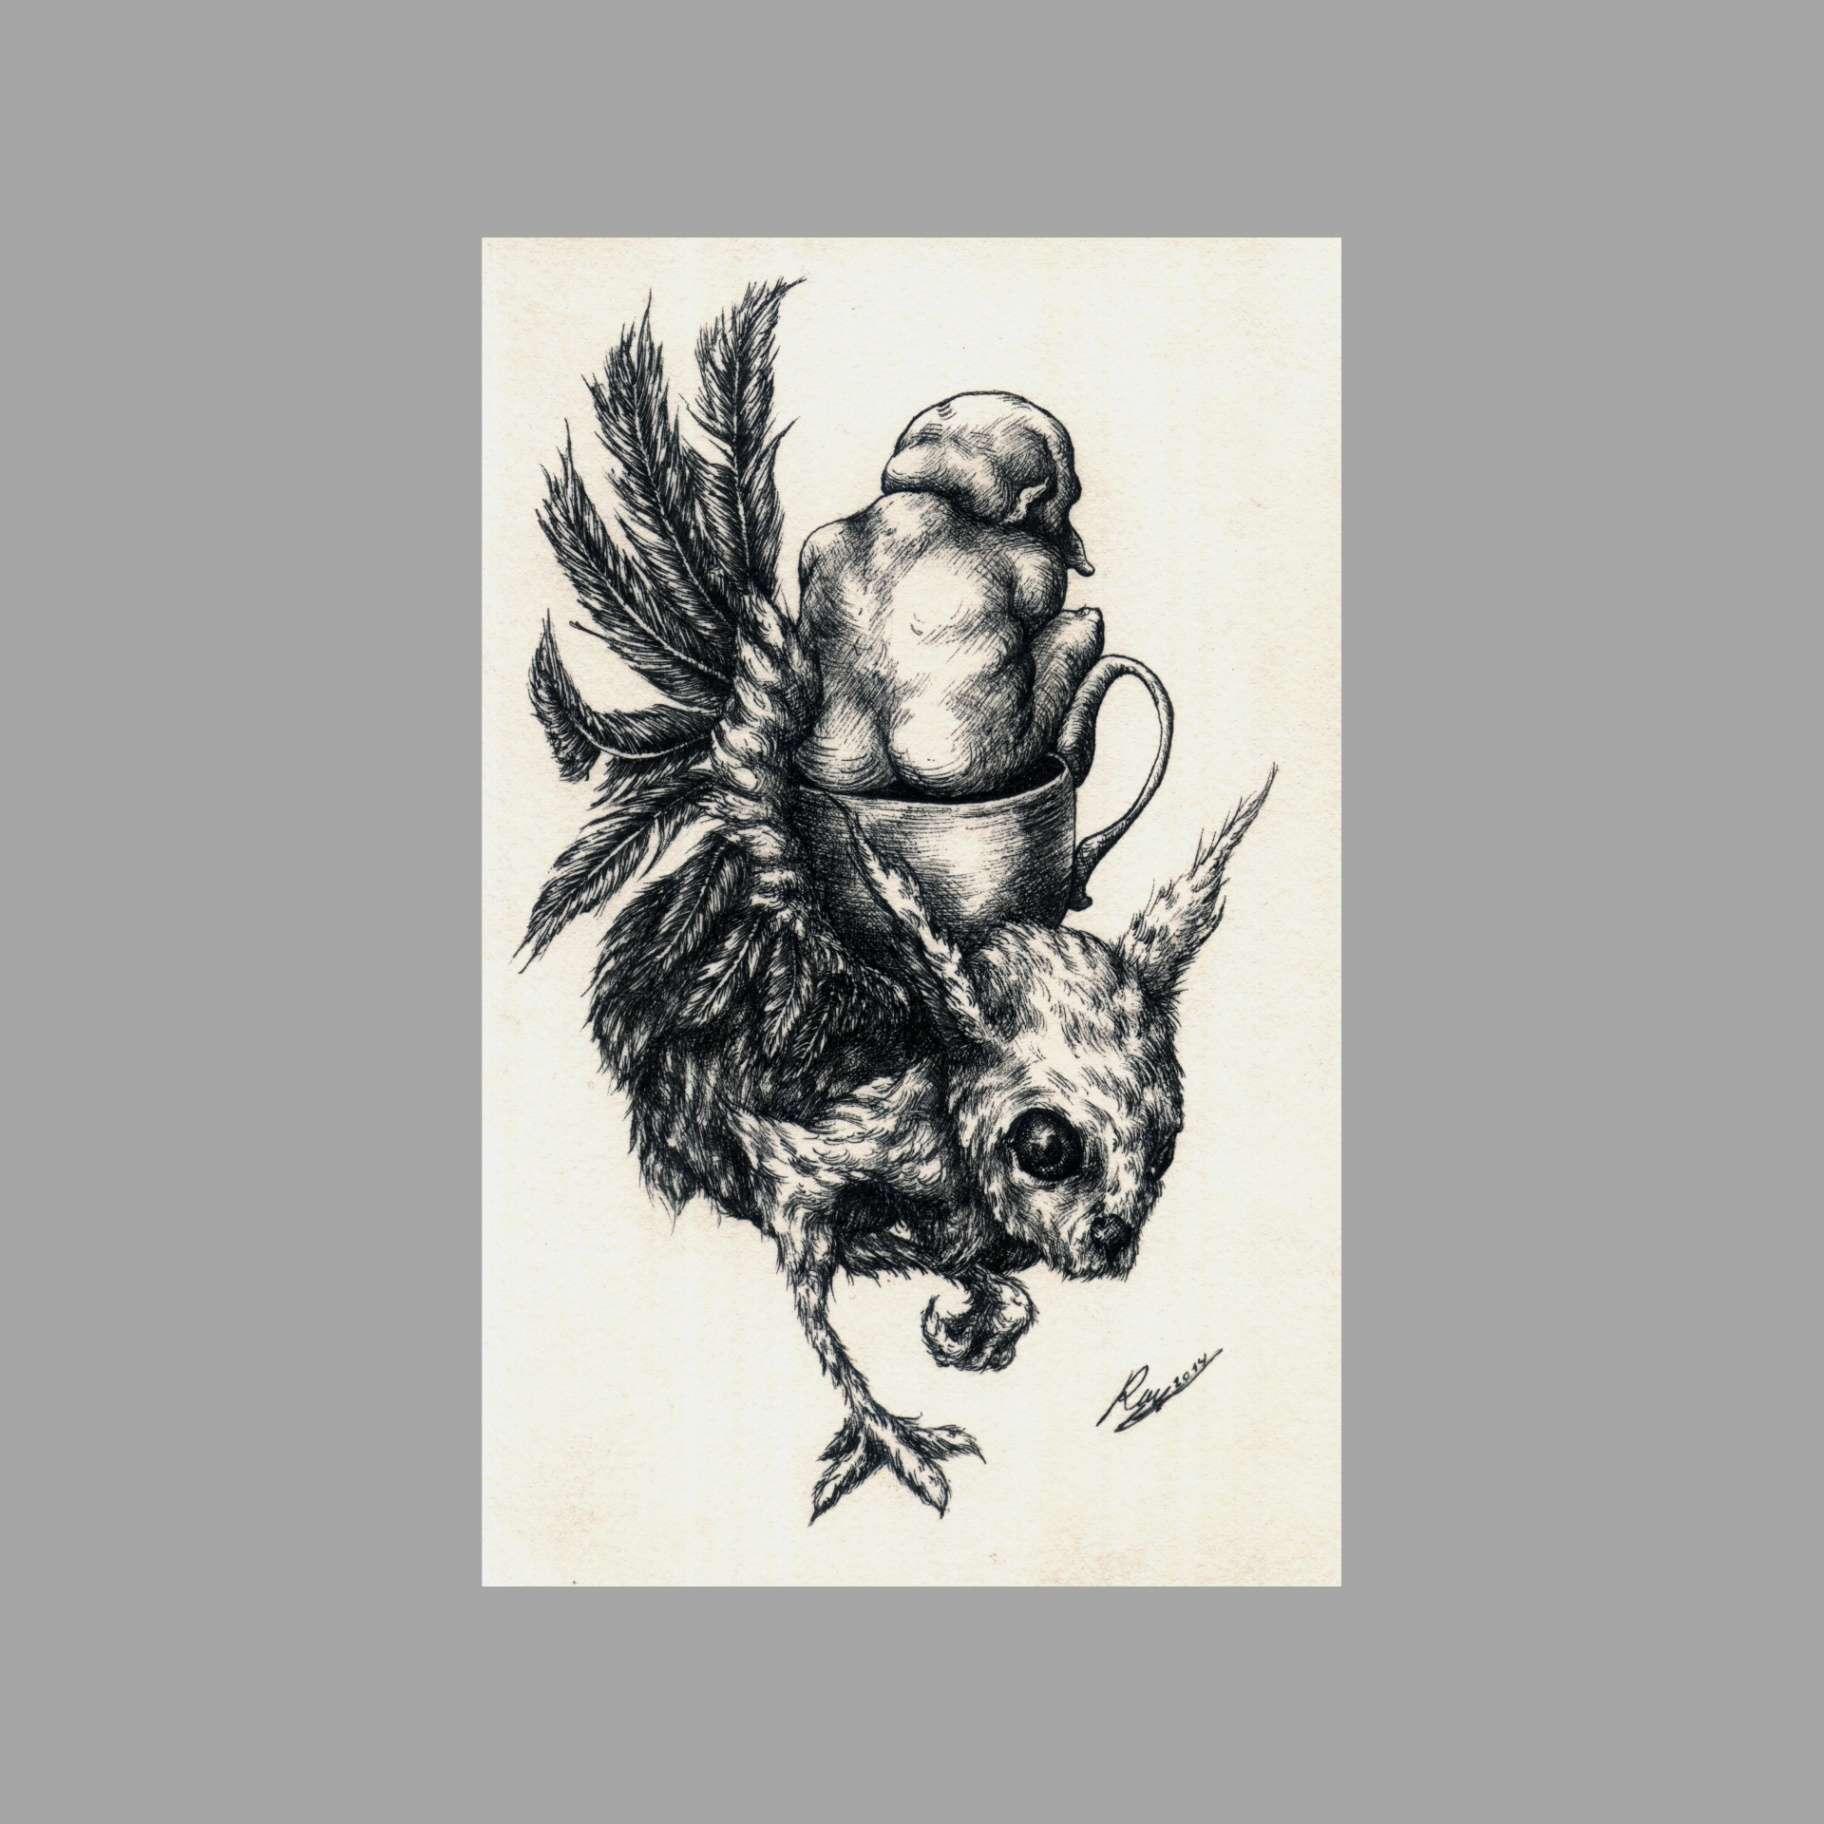 Obra: 2014 Meditando en Café (tinta sobre cartulina) (22x14cm)